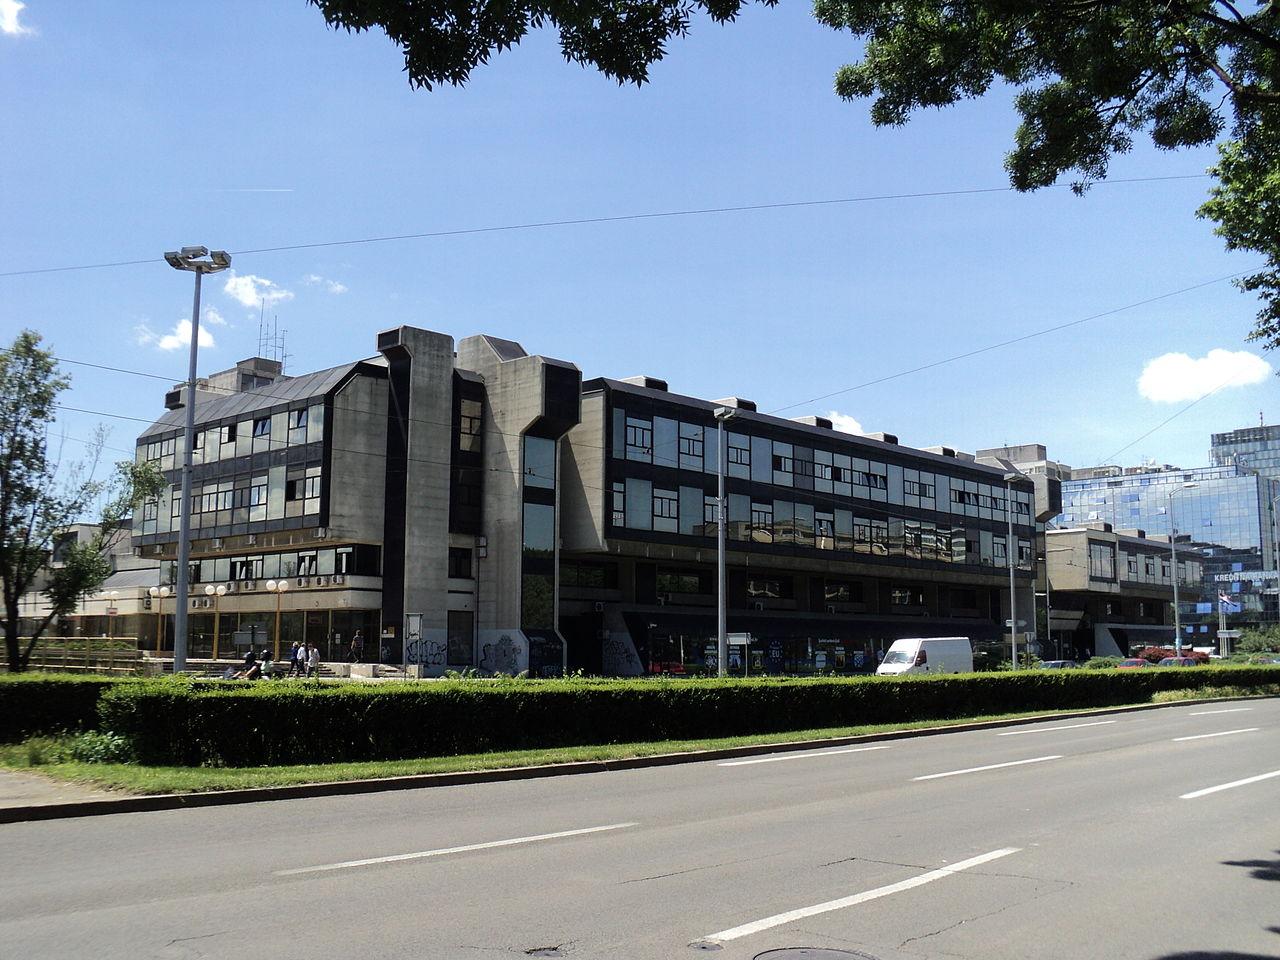 Zgrada Ministarstva poljoprivrede, ribarstva i ruralnog razvoja, Vukovarska 78, Zagreb (izvor: commons.wikimedia.org).